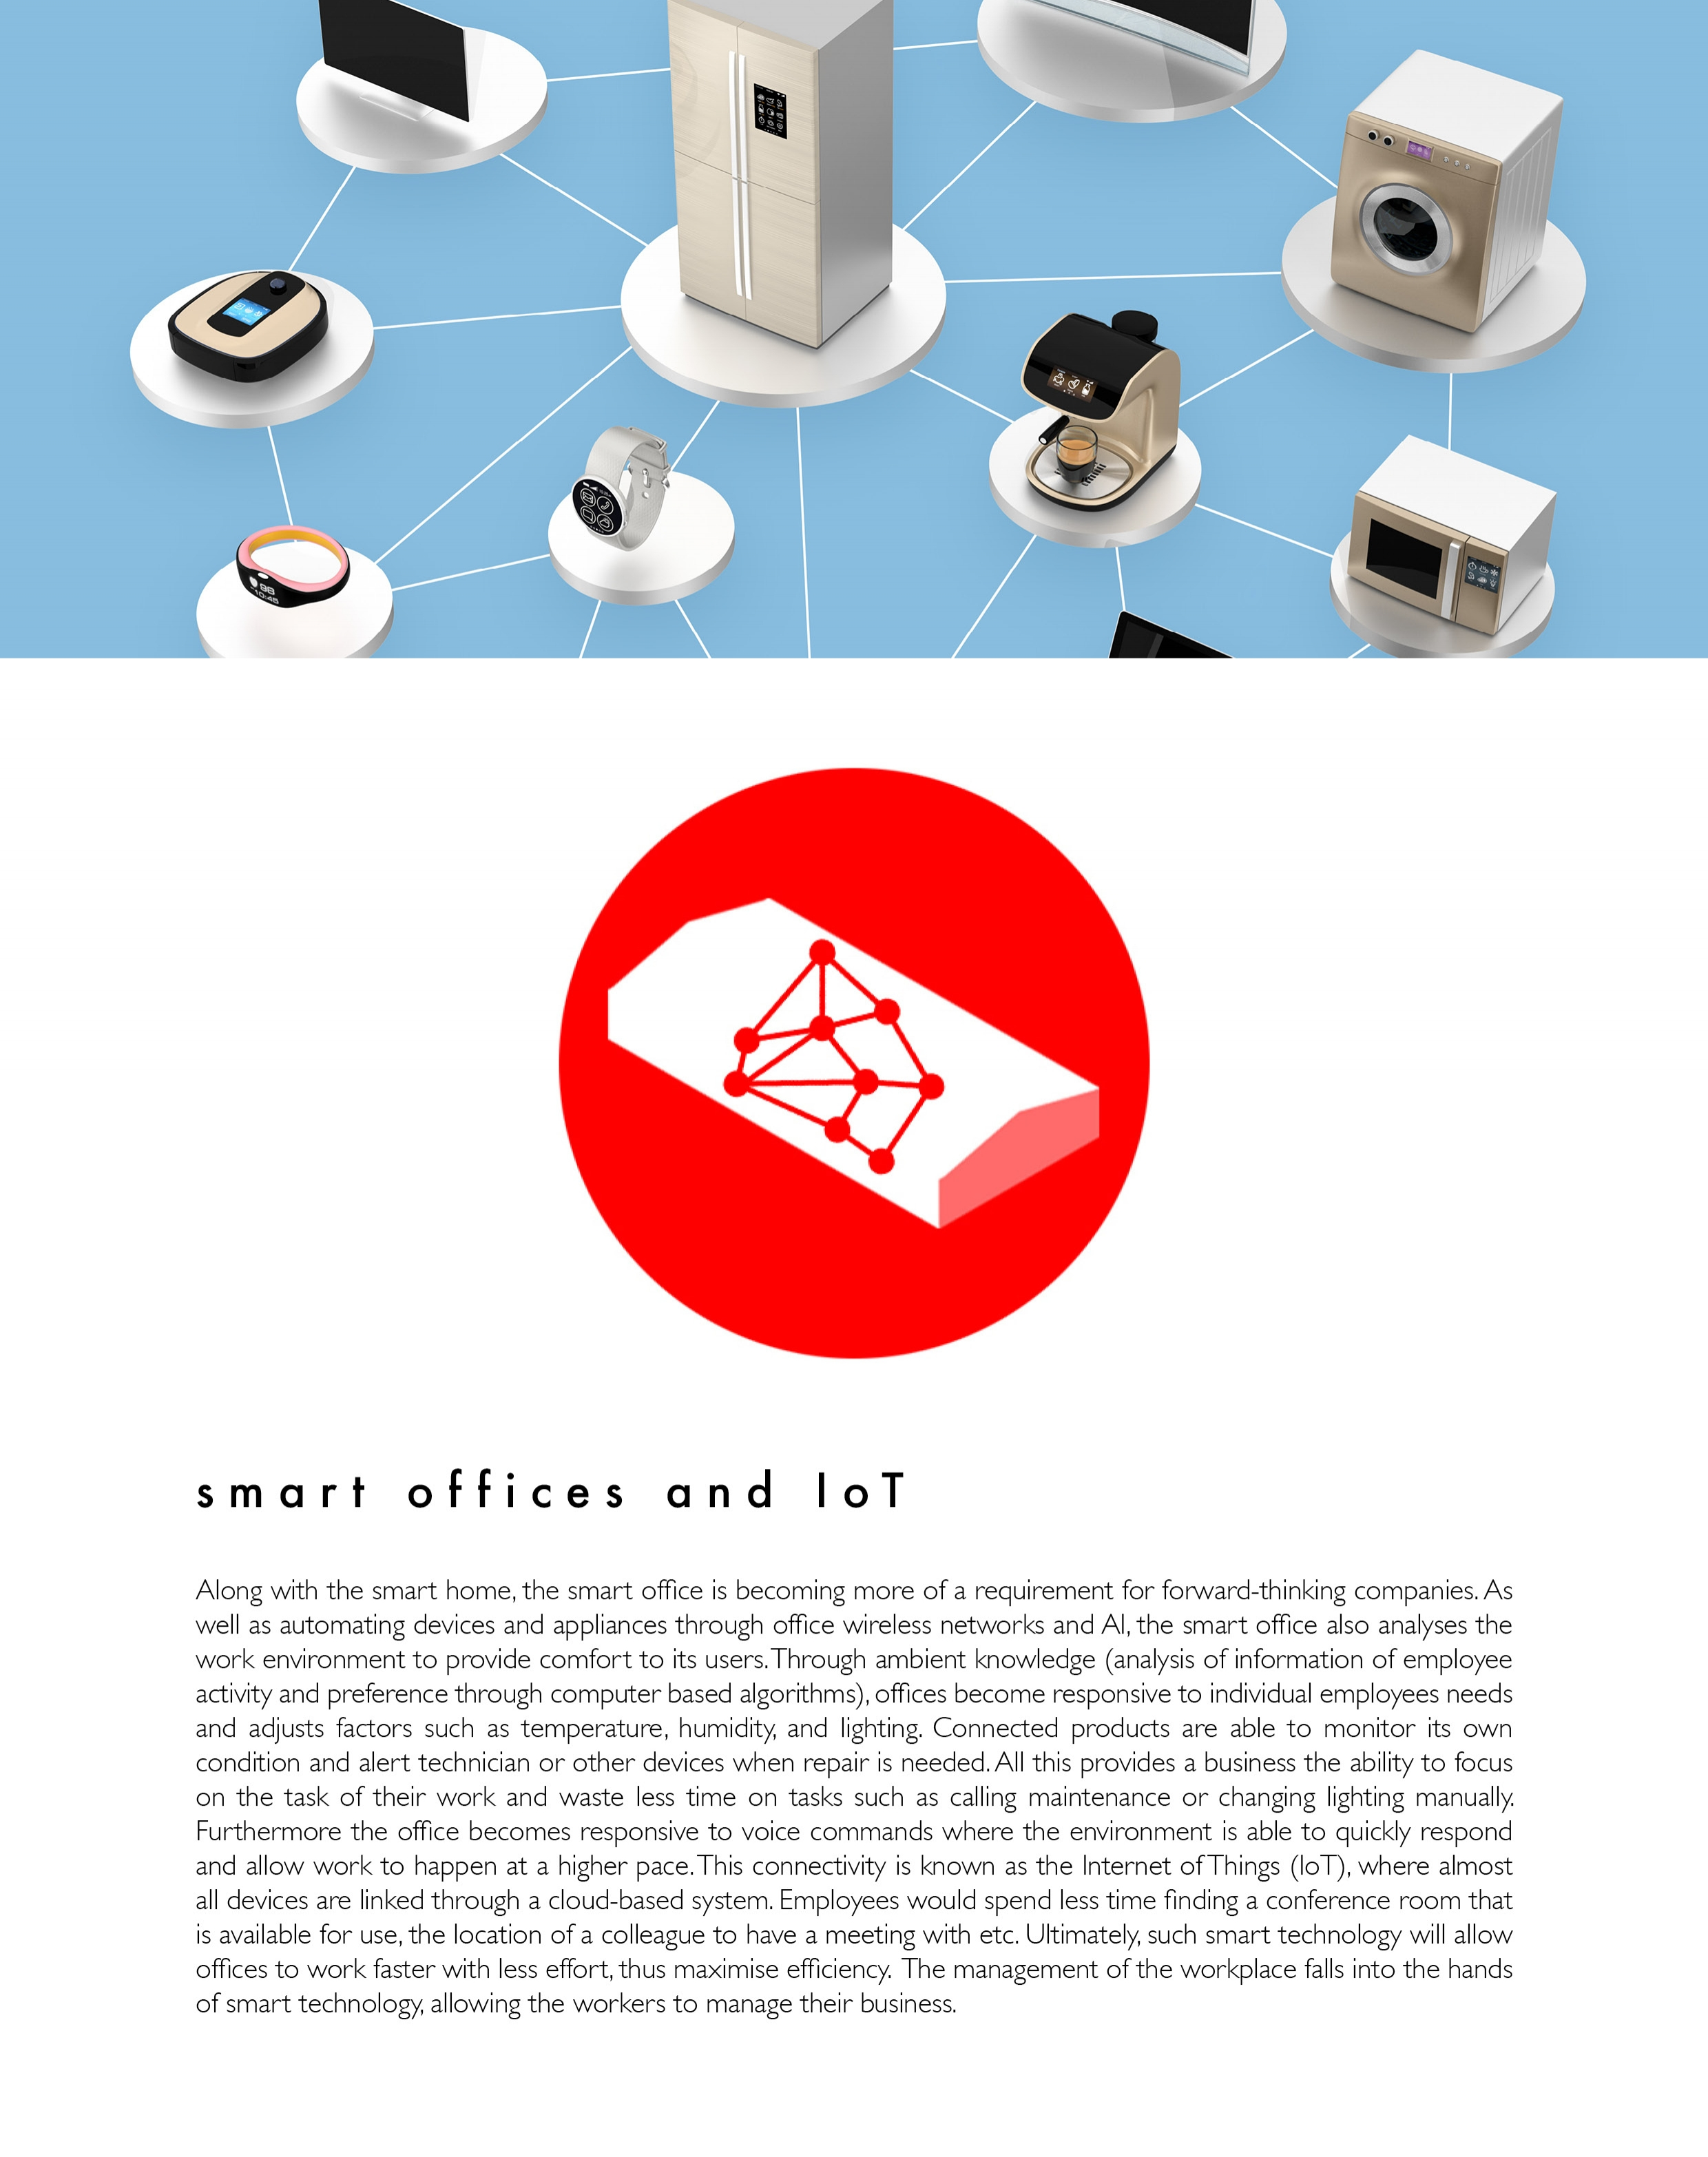 Atelier Aitken Workplace design Smart Place Internet of things IOT.jpg